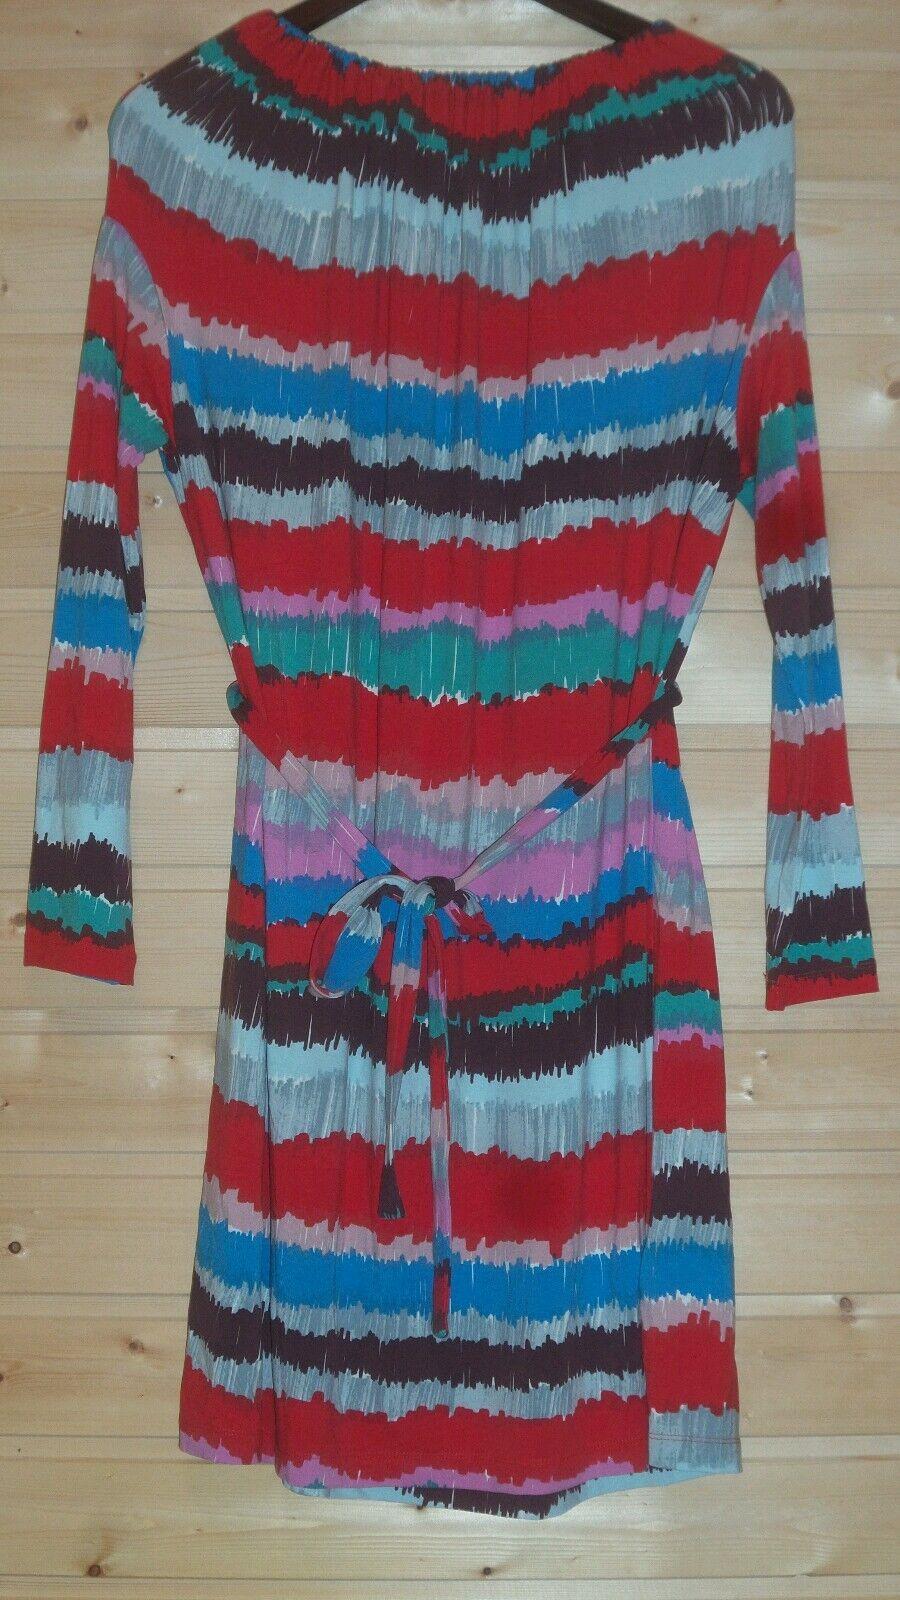 MARIMEKKO STRETCH VISCOSE LONG SLEEVE COLORFUL DRESS URO SZ S WAIST STRAP NWOT